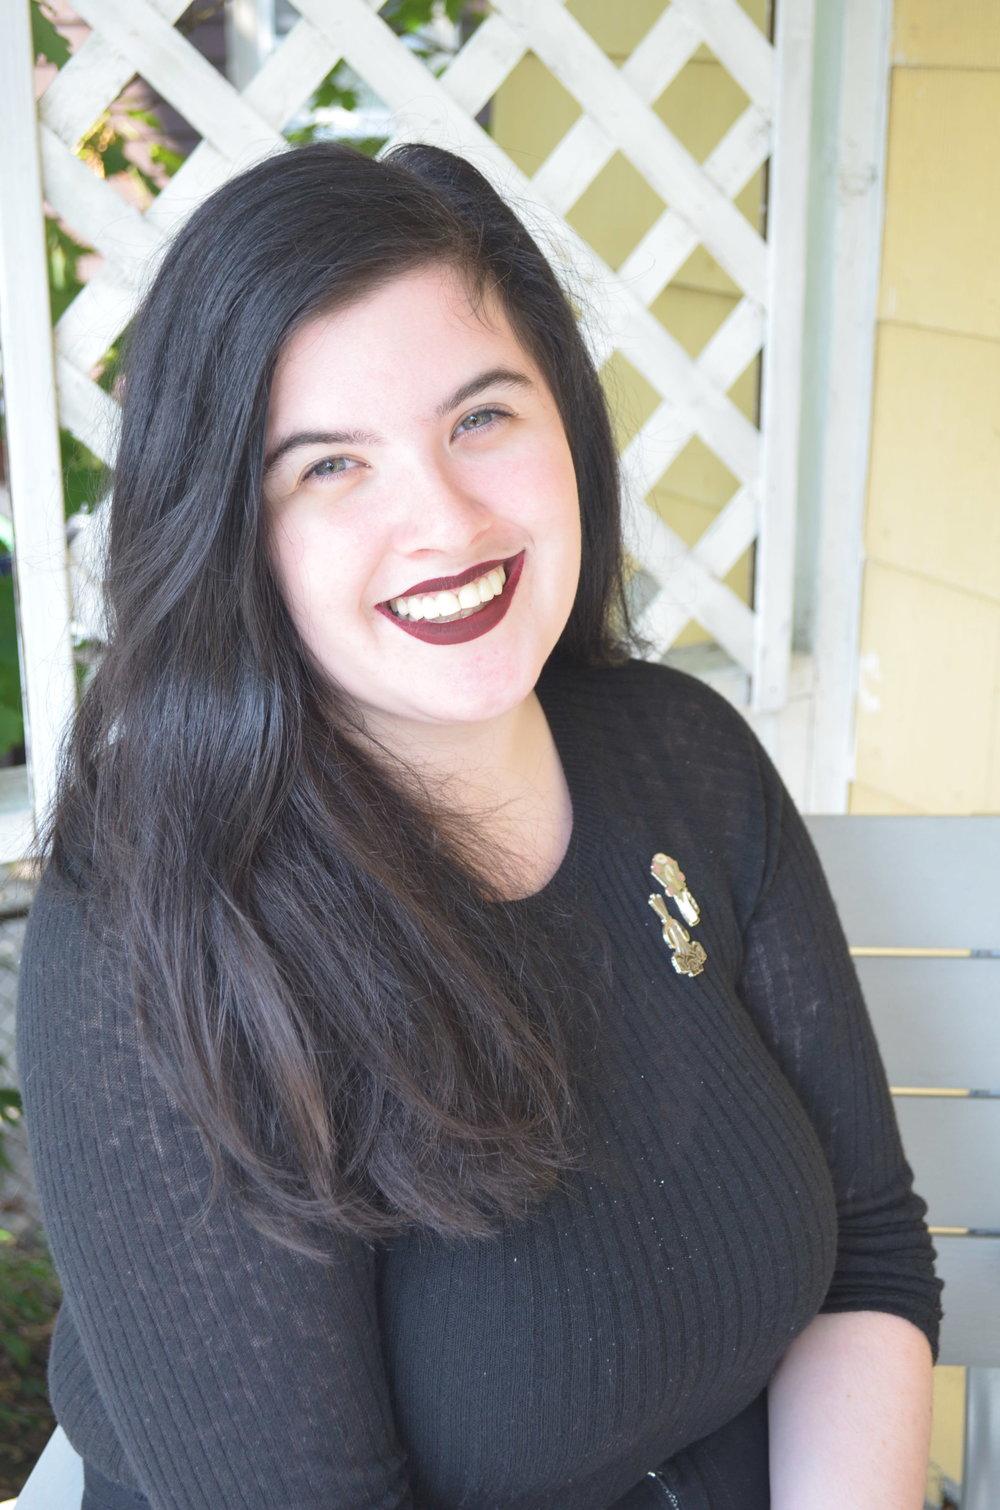 SarahBrynnHolliday.JPG